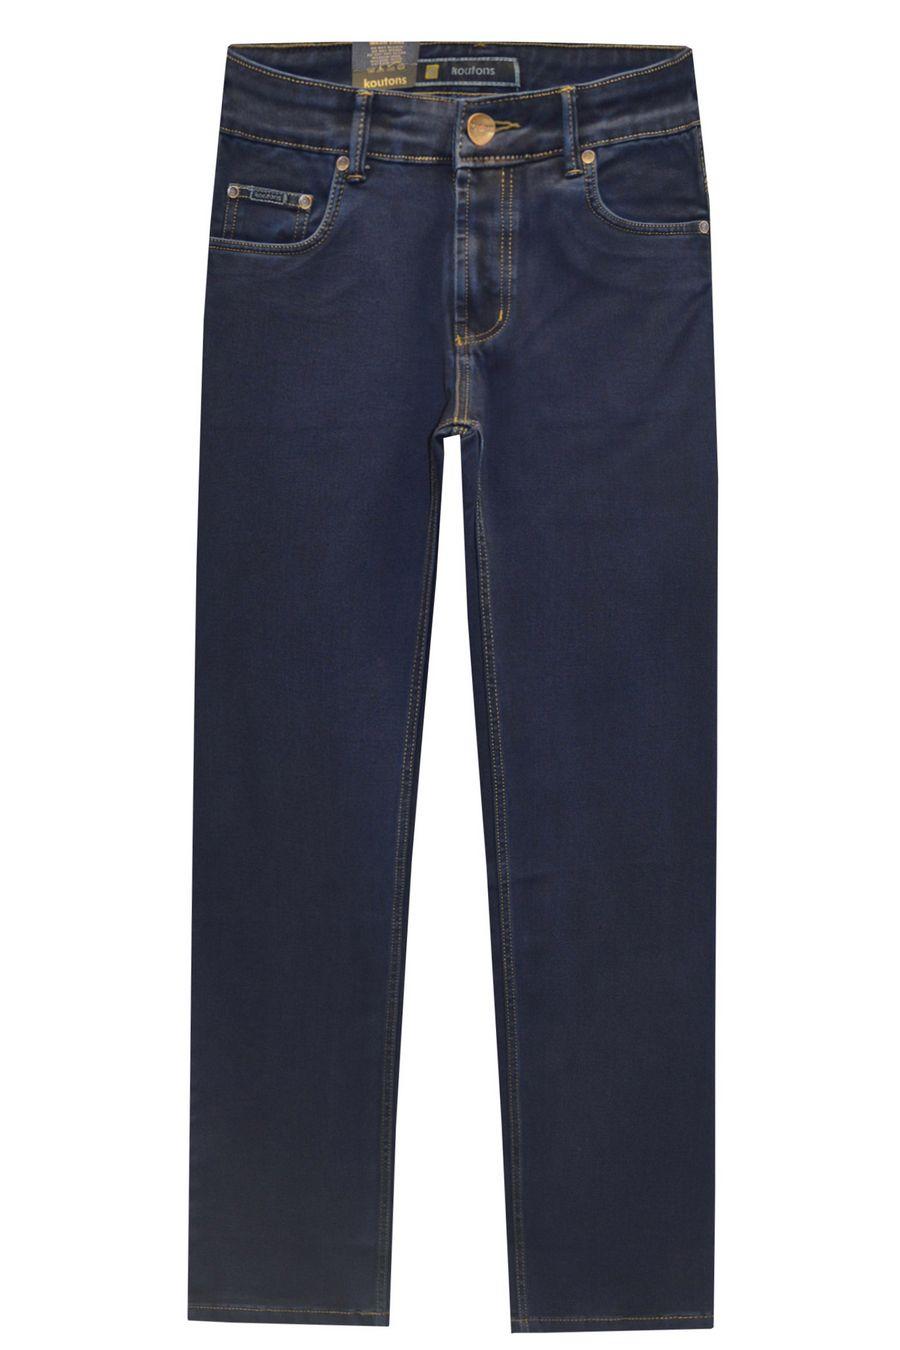 Джинсы мужские Koutons ST-0-590-7 Stretch Black-Blue (31-38) - фото 1